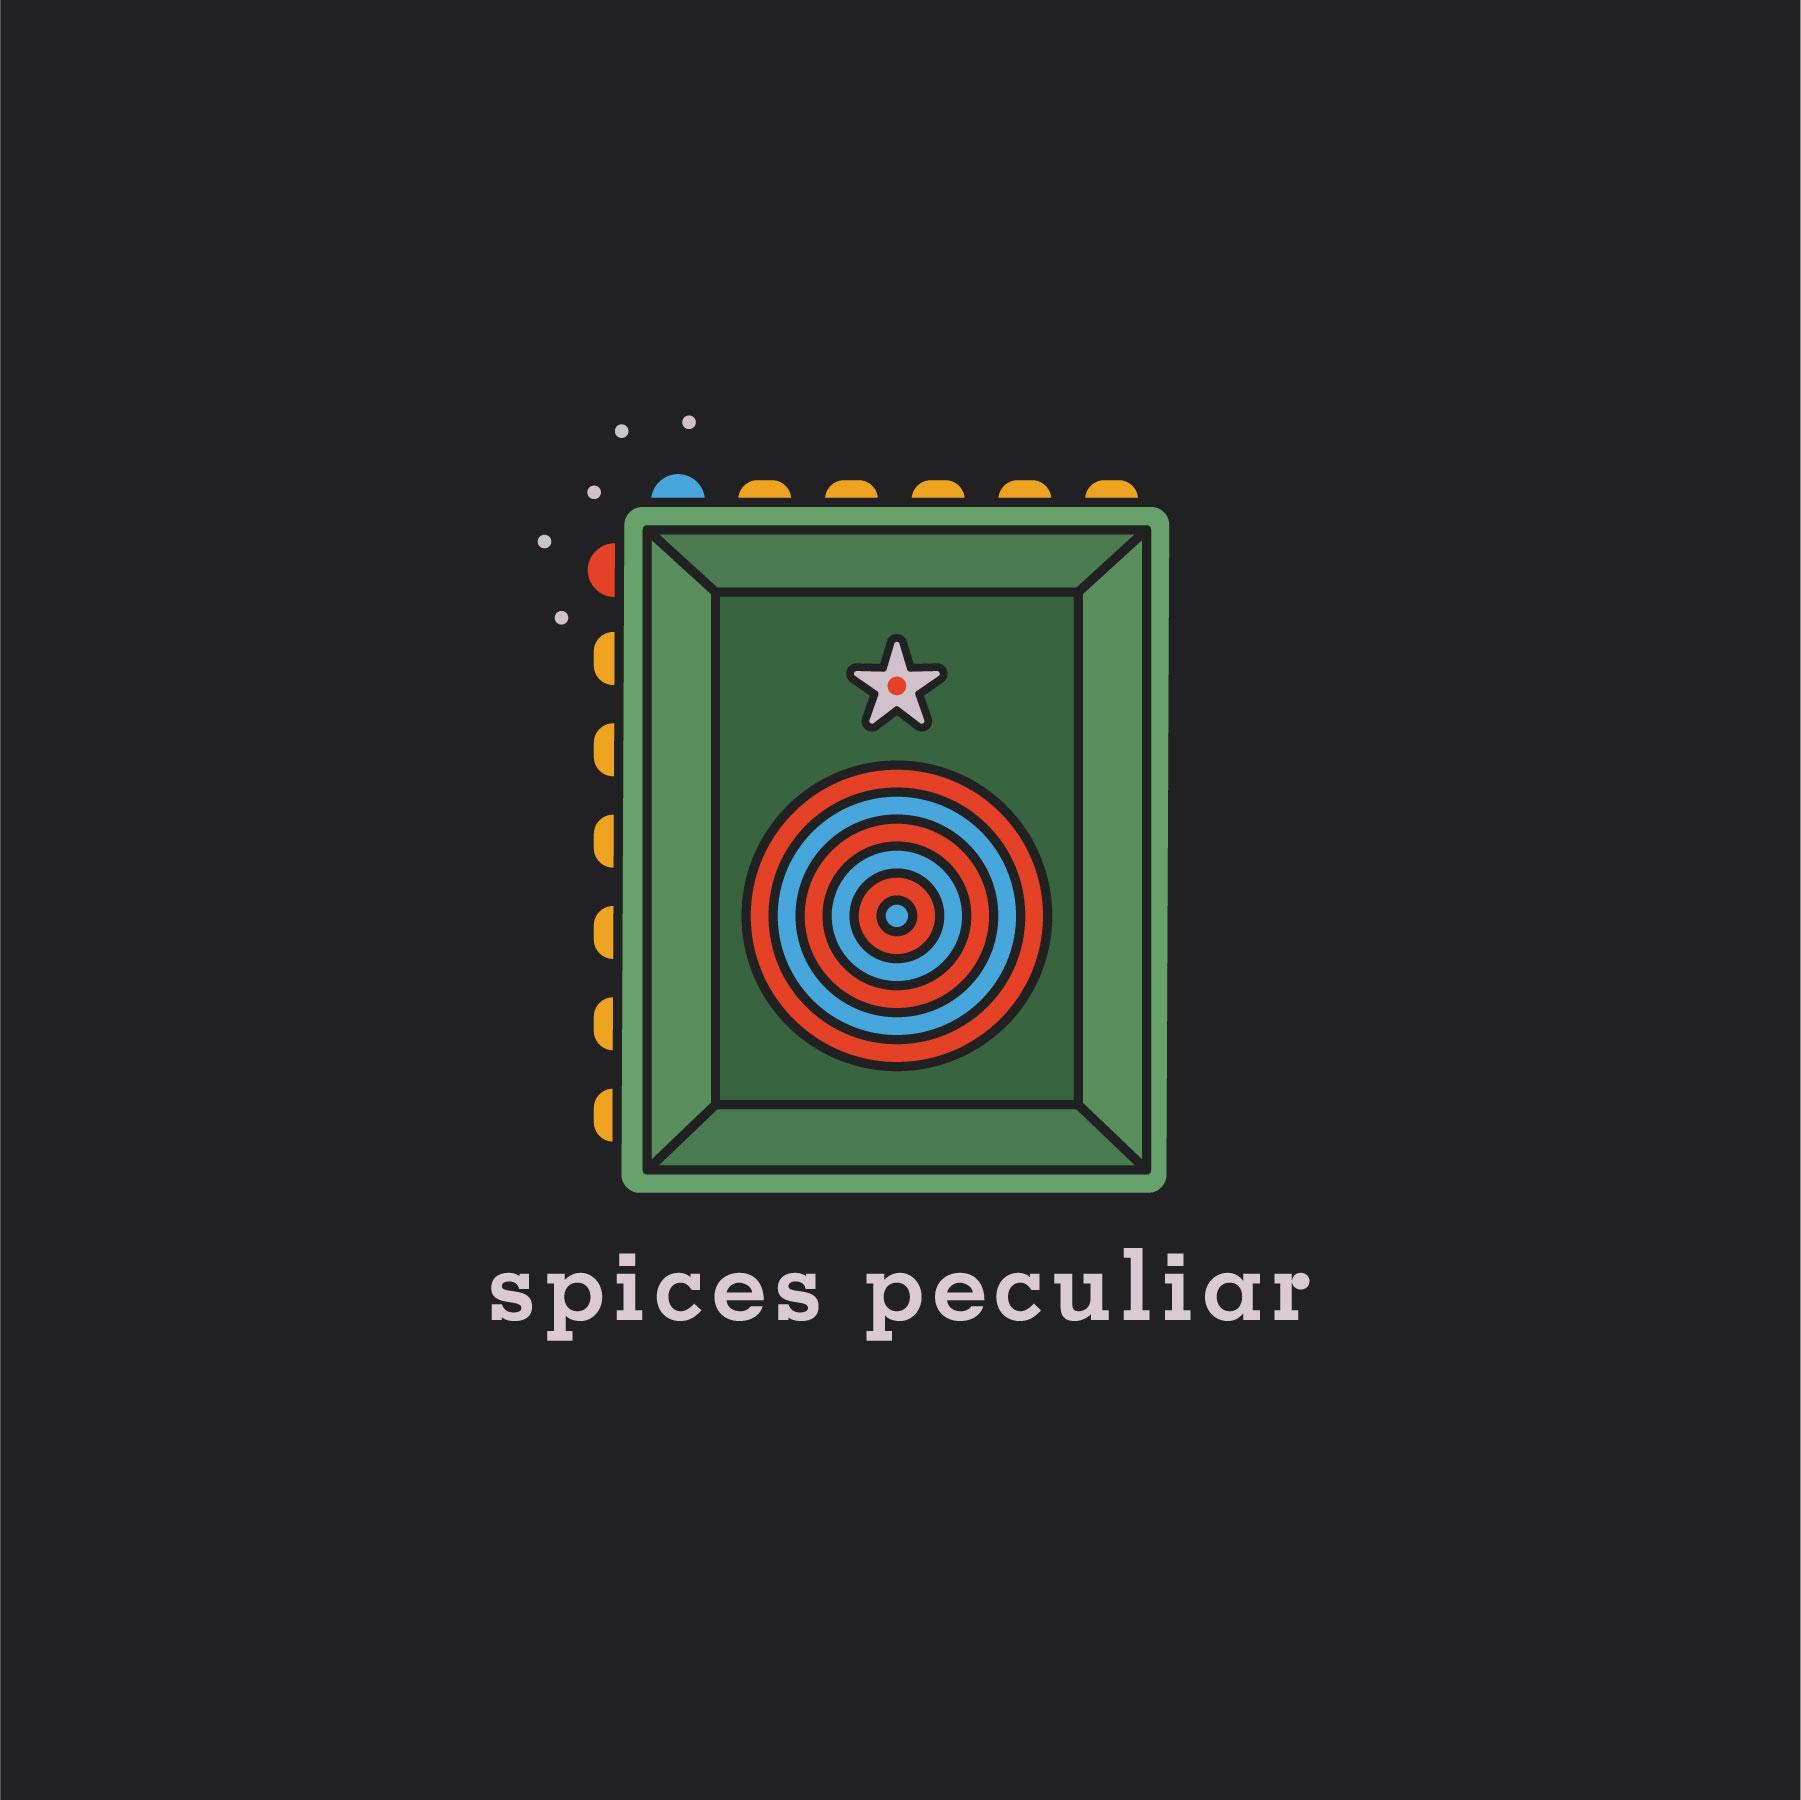 logo_spicesPeculiar_artwork.jpg